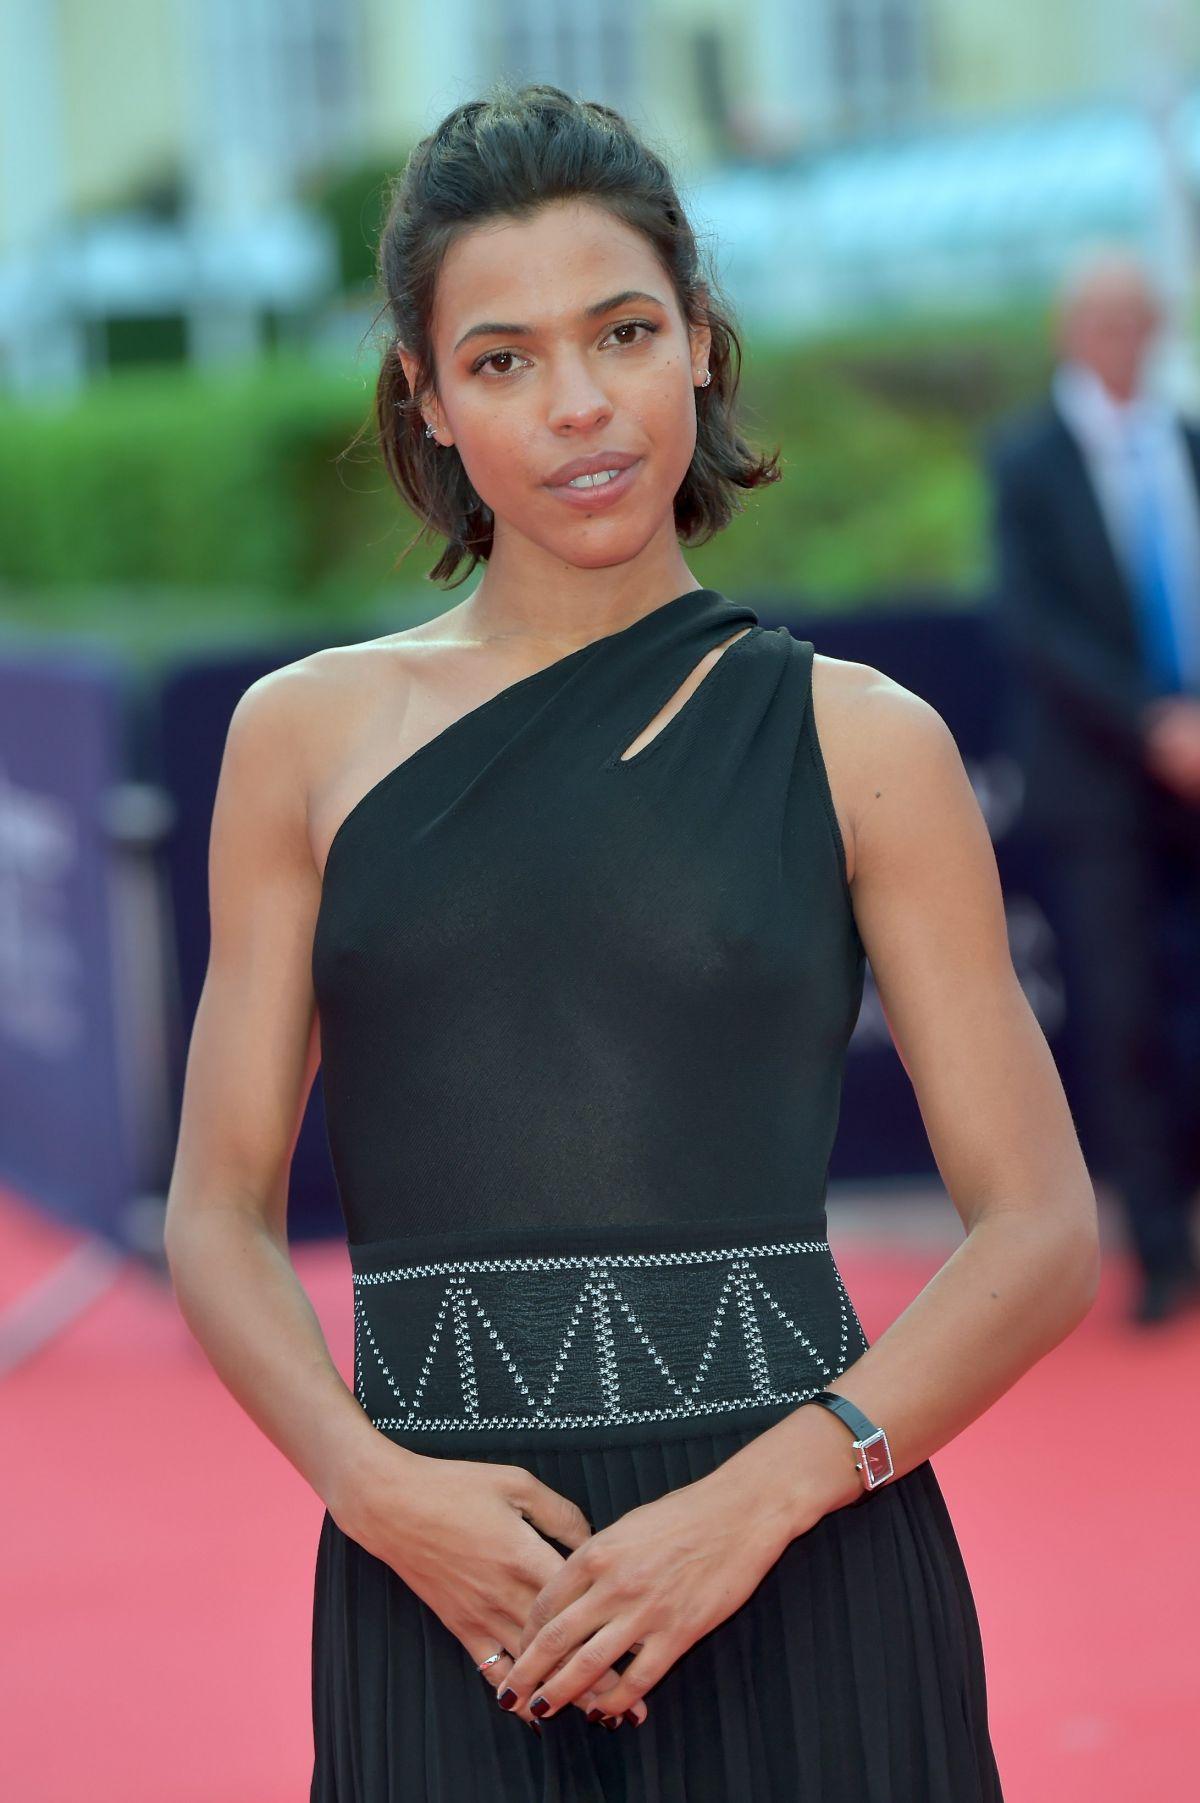 ZITA HANROT at 46th Deauville American Film Festival